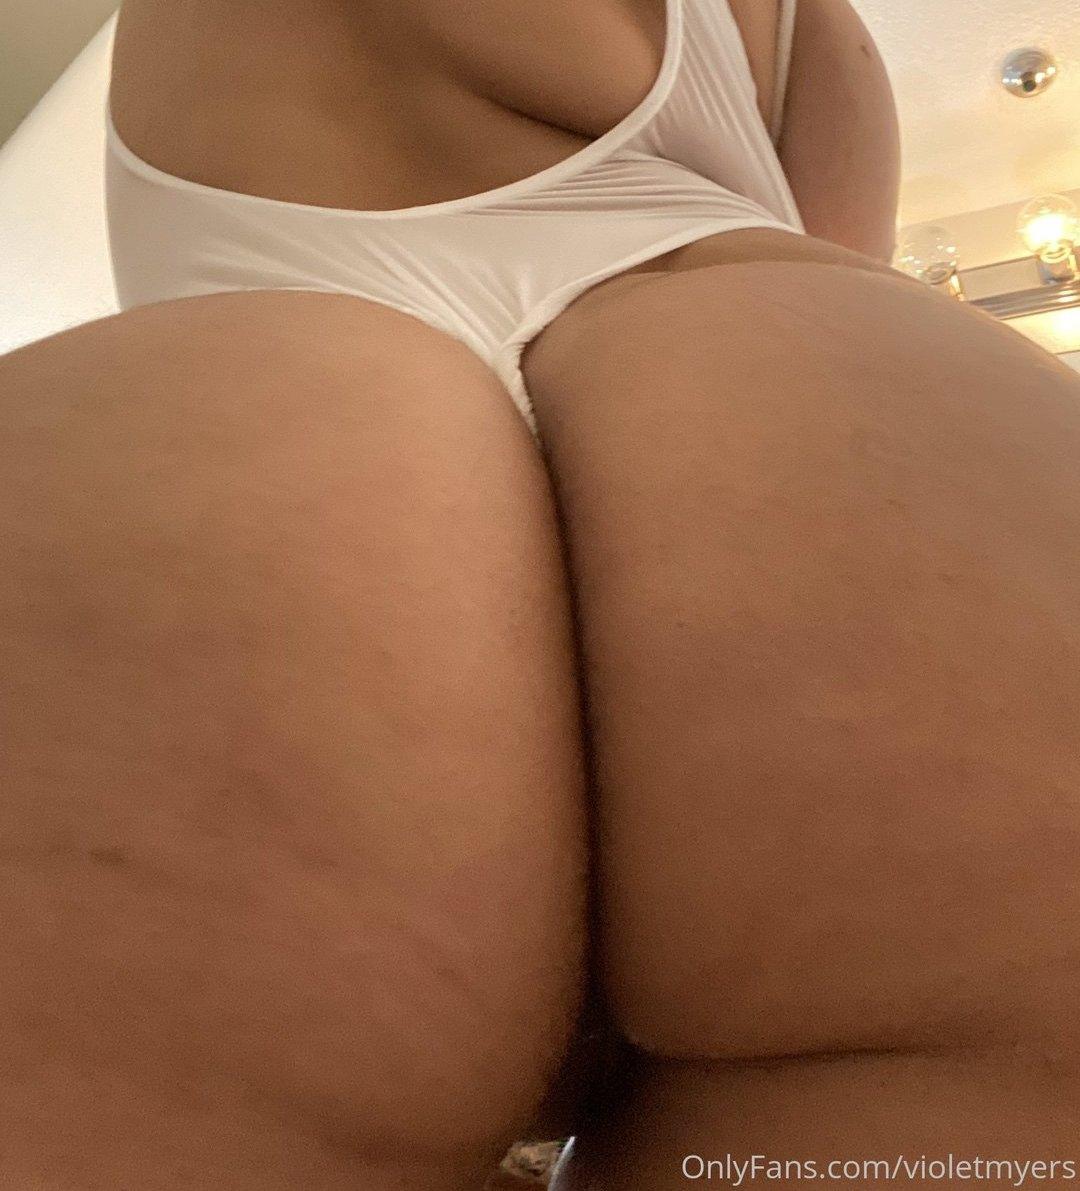 Violet Myers Violetmyers Onlyfans Nudes Leaks 0011